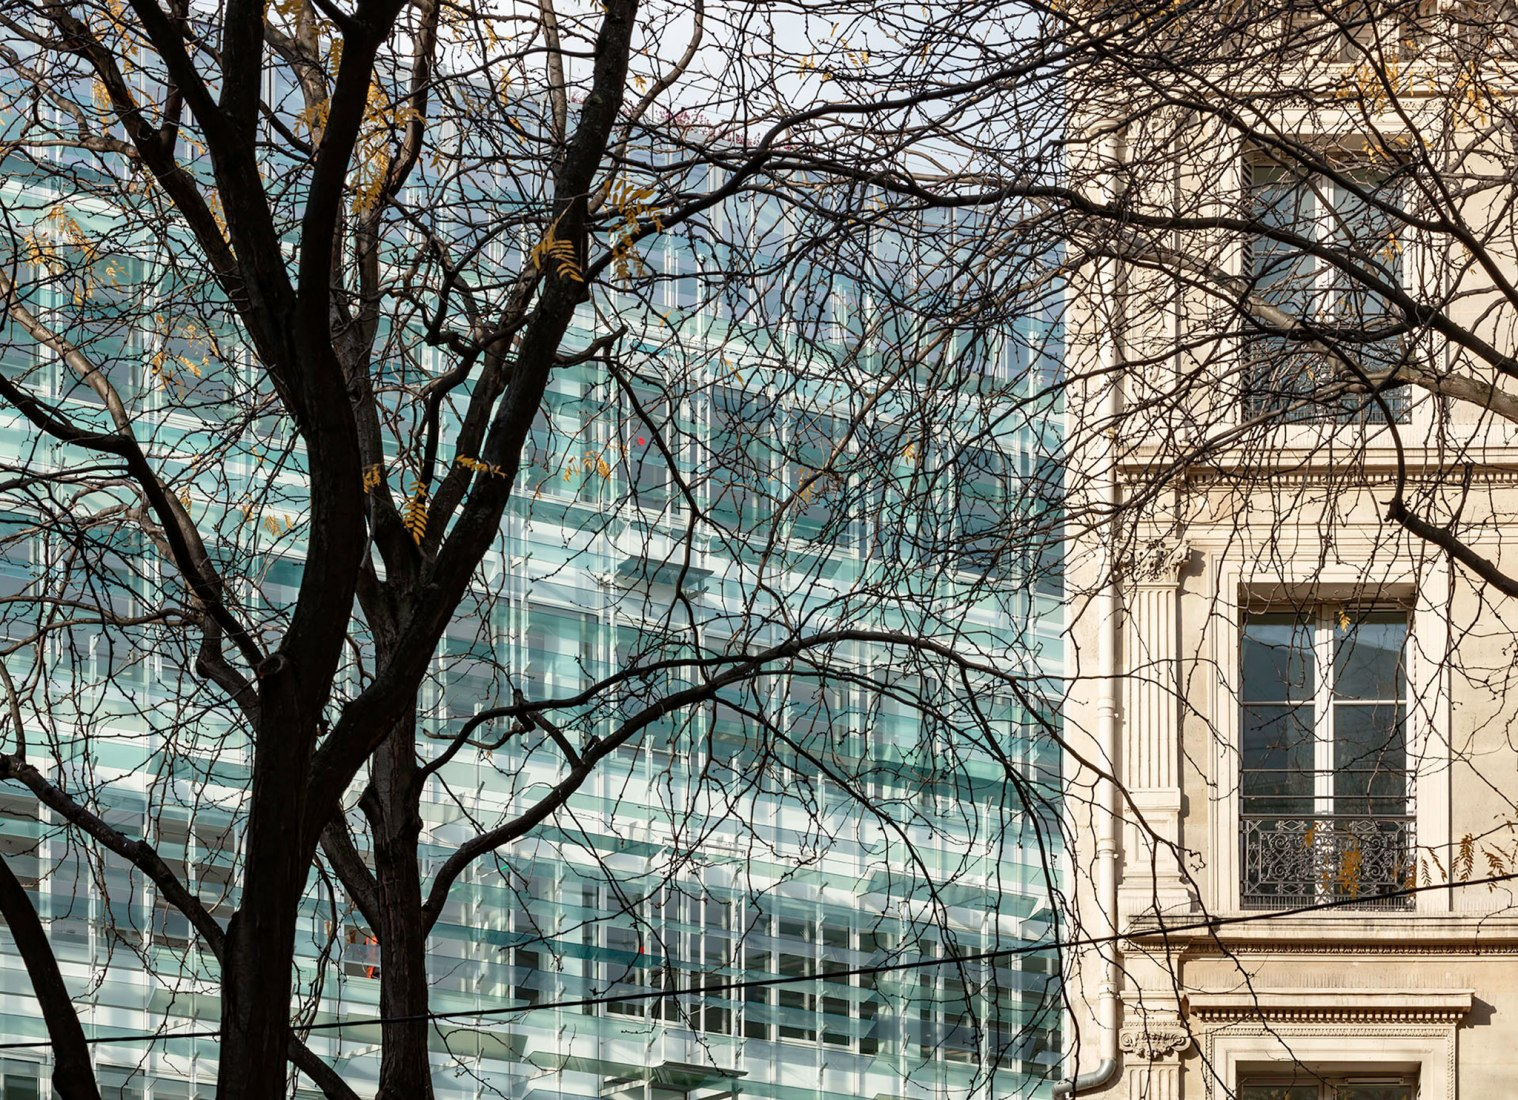 Complejo de uso mixto Grand Central Saint-Lazare por Ferrier Marchetti Studio. Fotografía por Luc Boegly